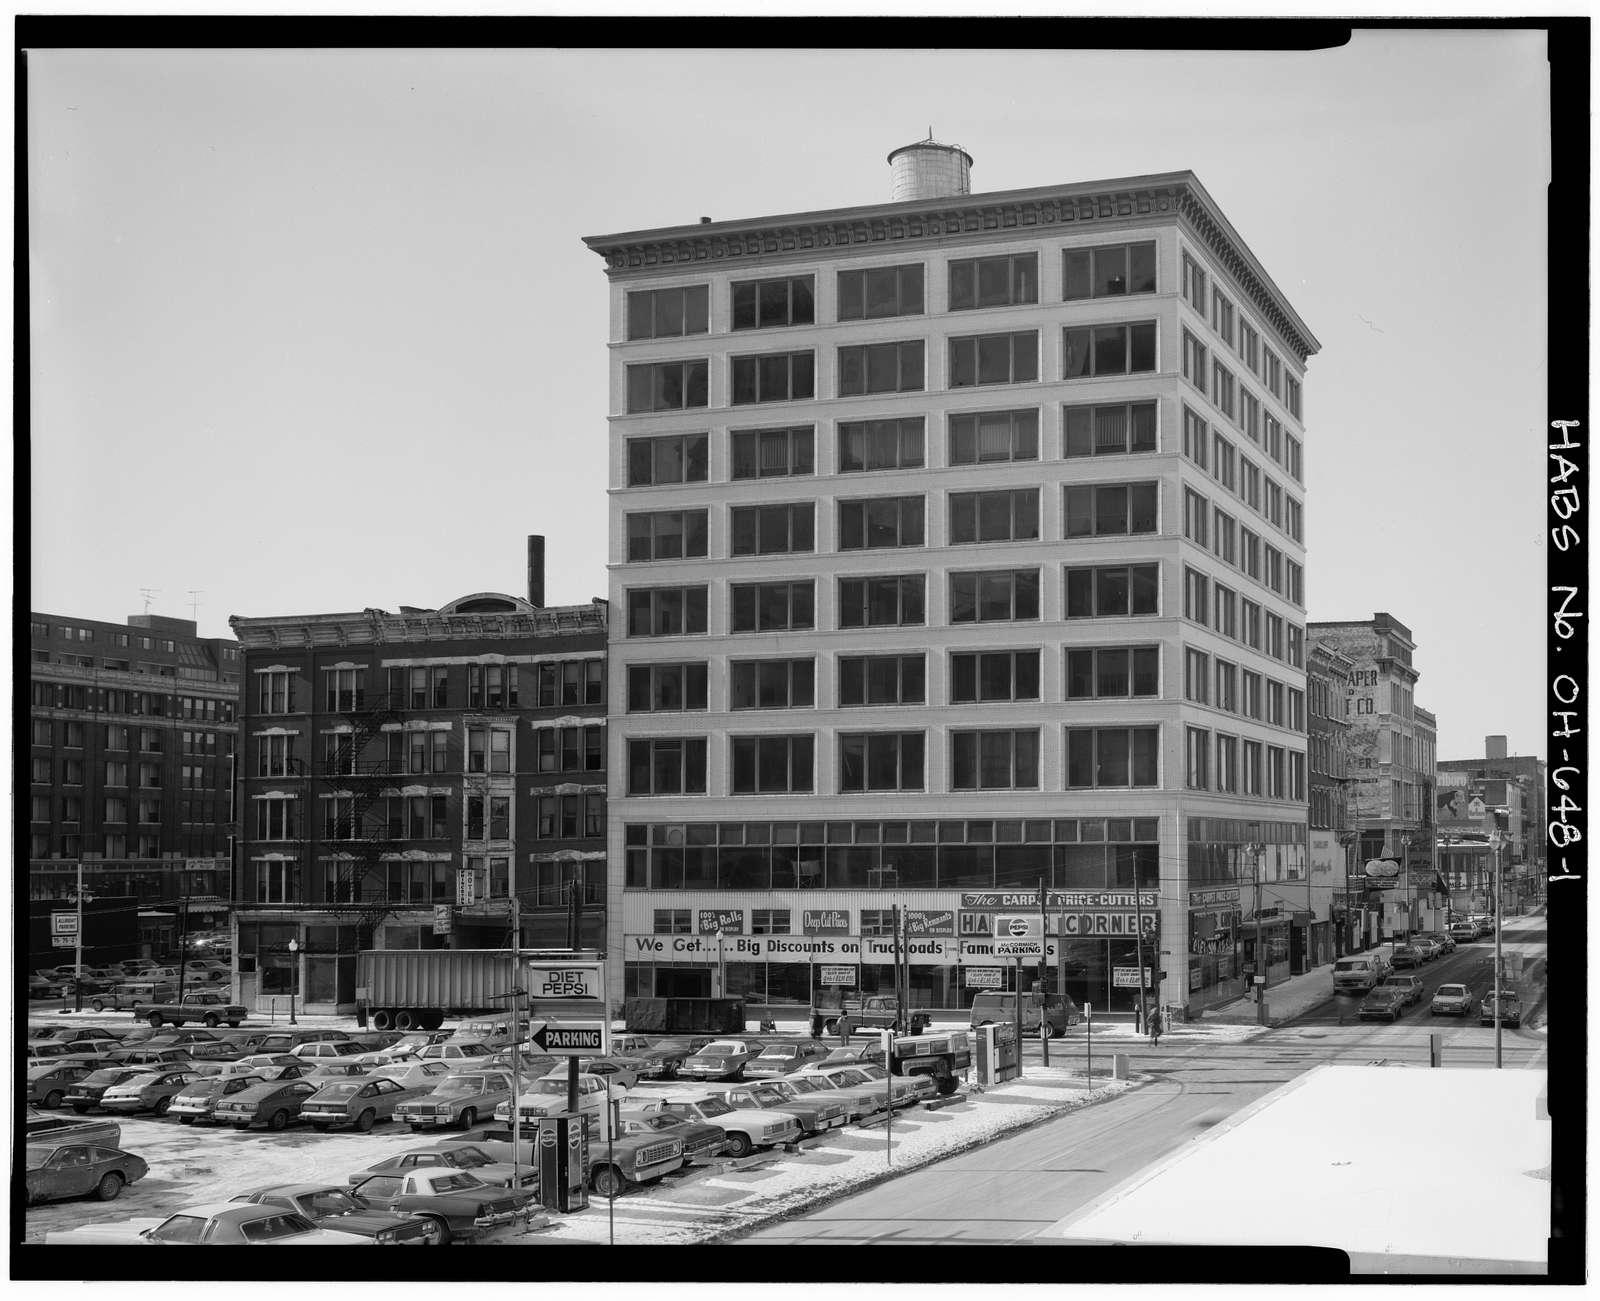 201-205 West Fifth Street (Commercial Building), Cincinnati, Hamilton County, OH